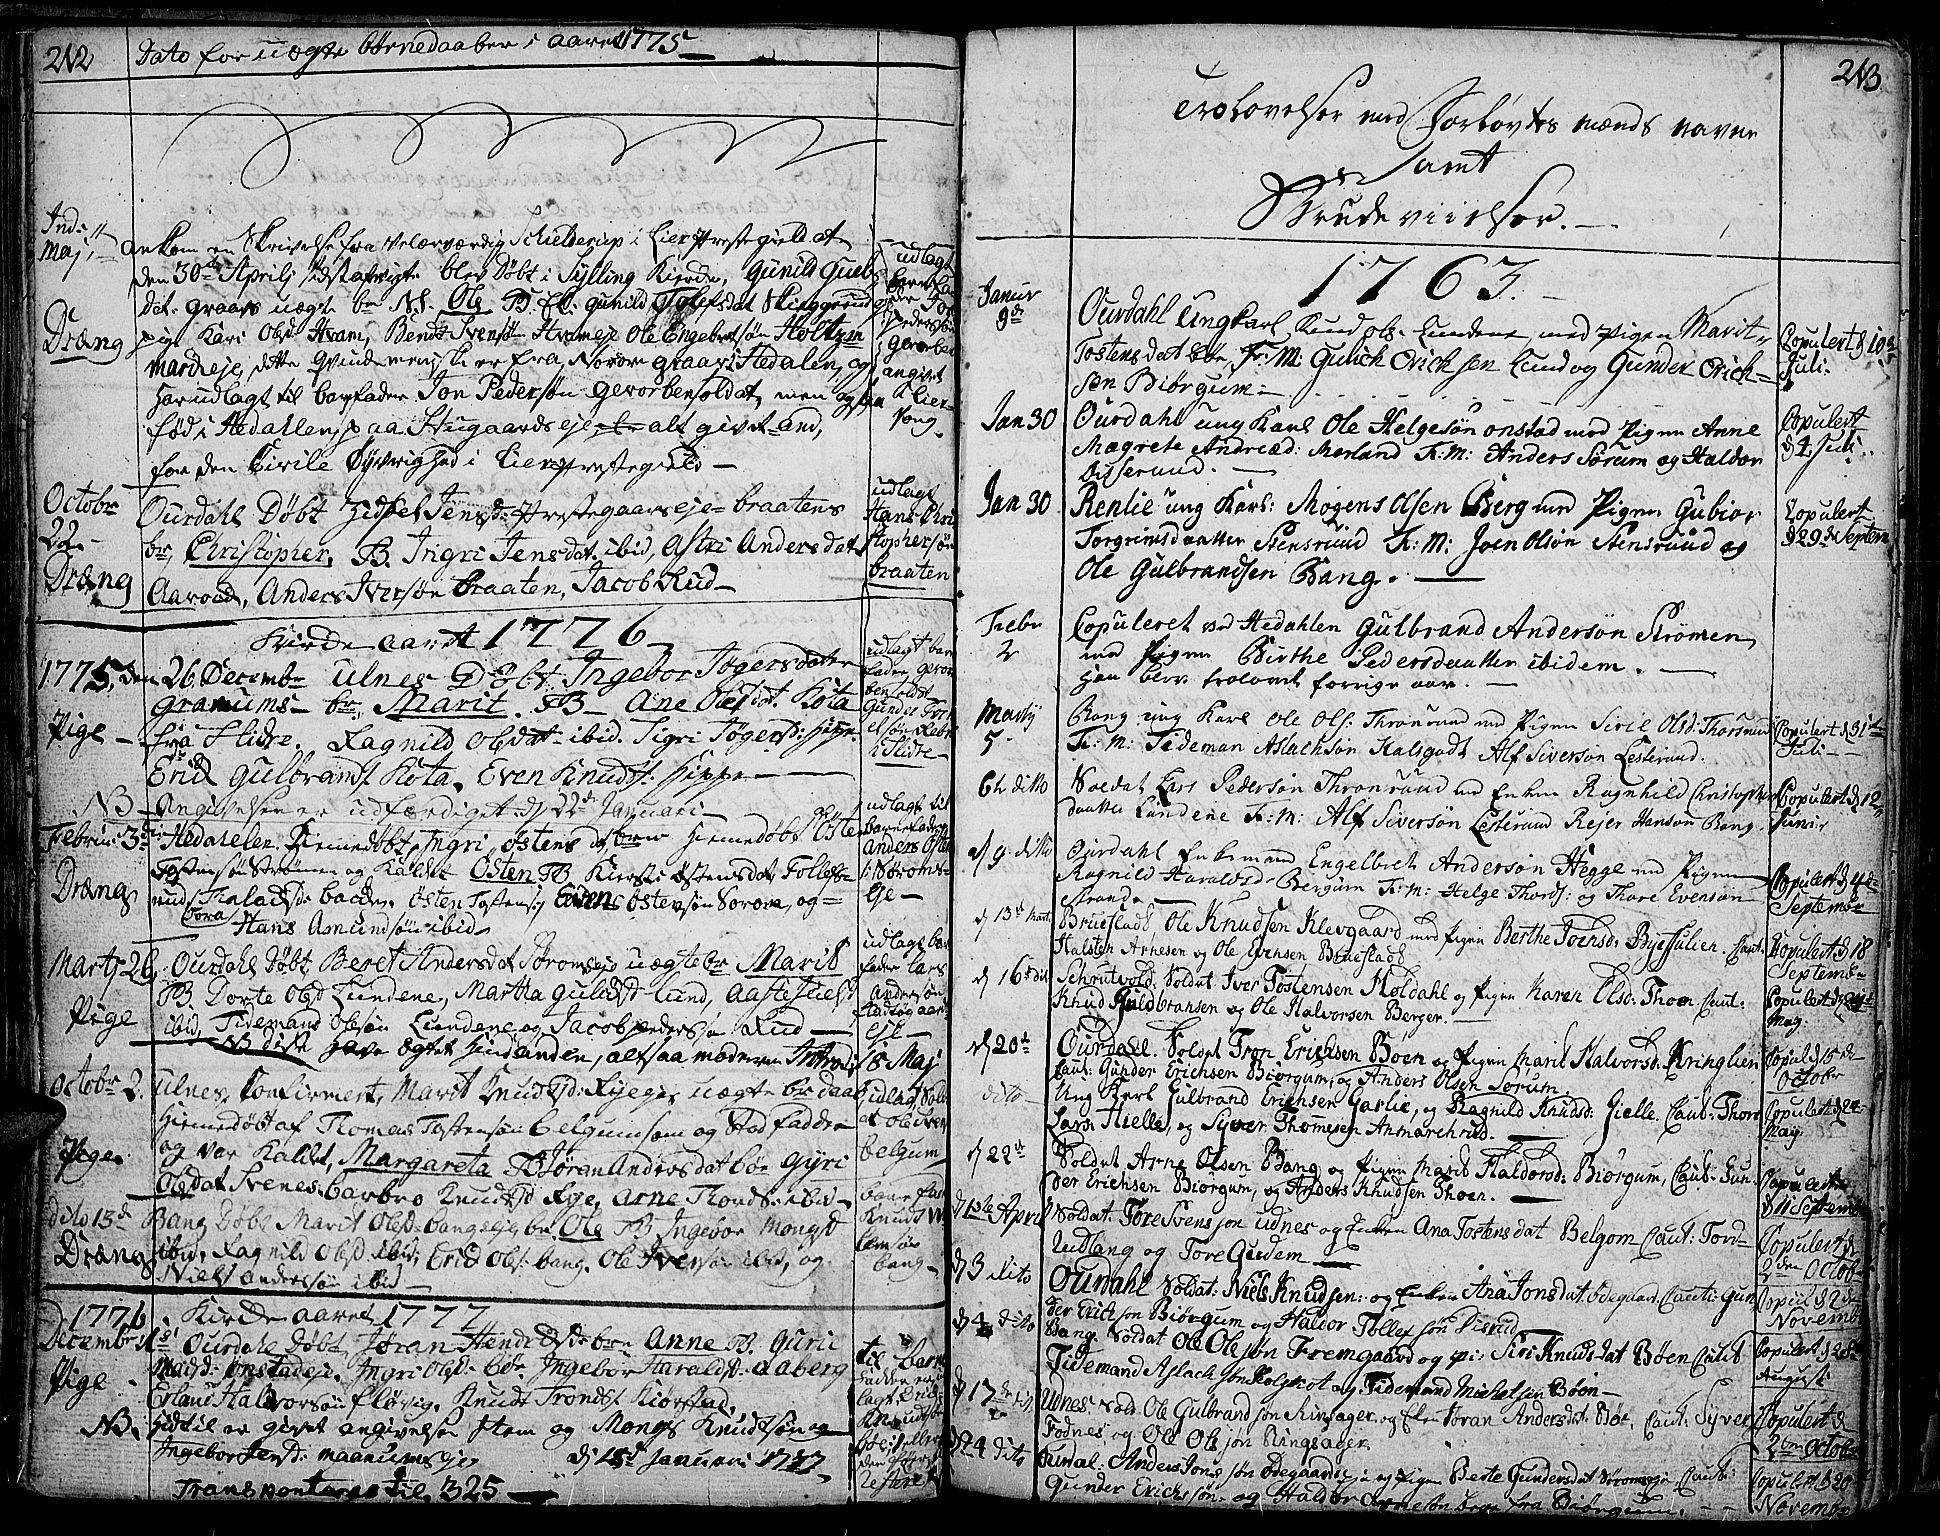 SAH, Aurdal prestekontor, Ministerialbok nr. 5, 1763-1781, s. 212-213